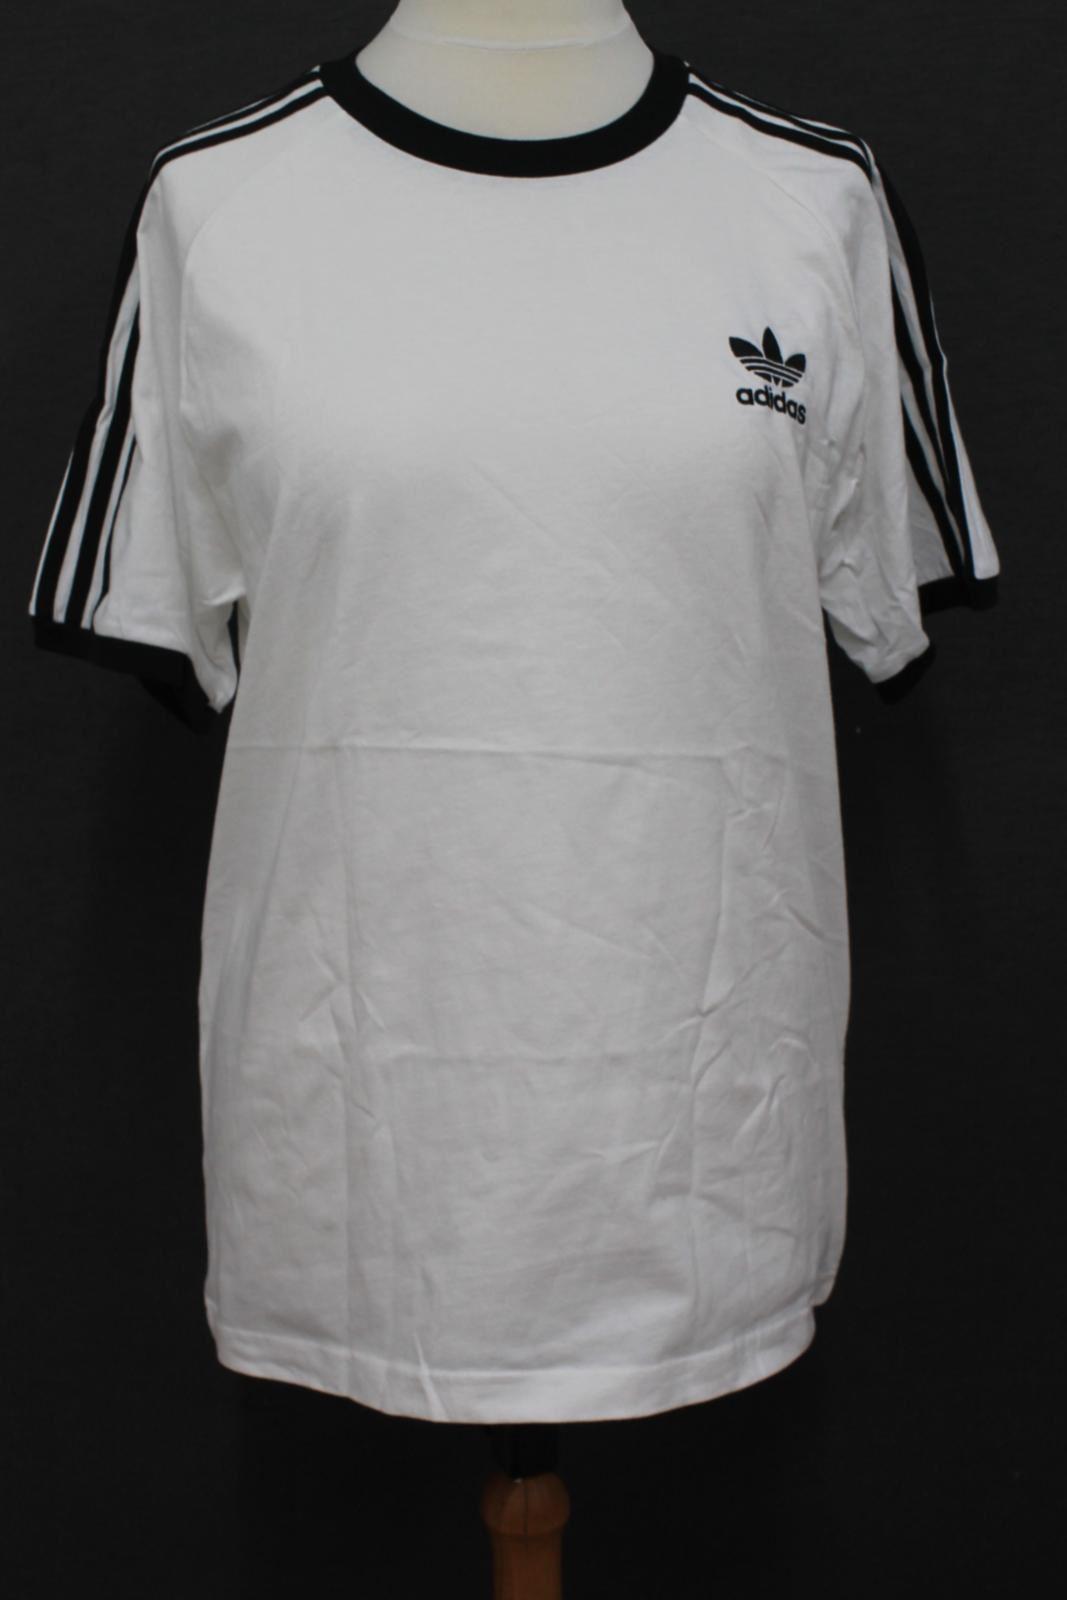 ADIDAS-Men-039-s-White-Original-3-Stripes-Short-Sleeve-Crew-Neck-T-Shirt-Size-L-NEW